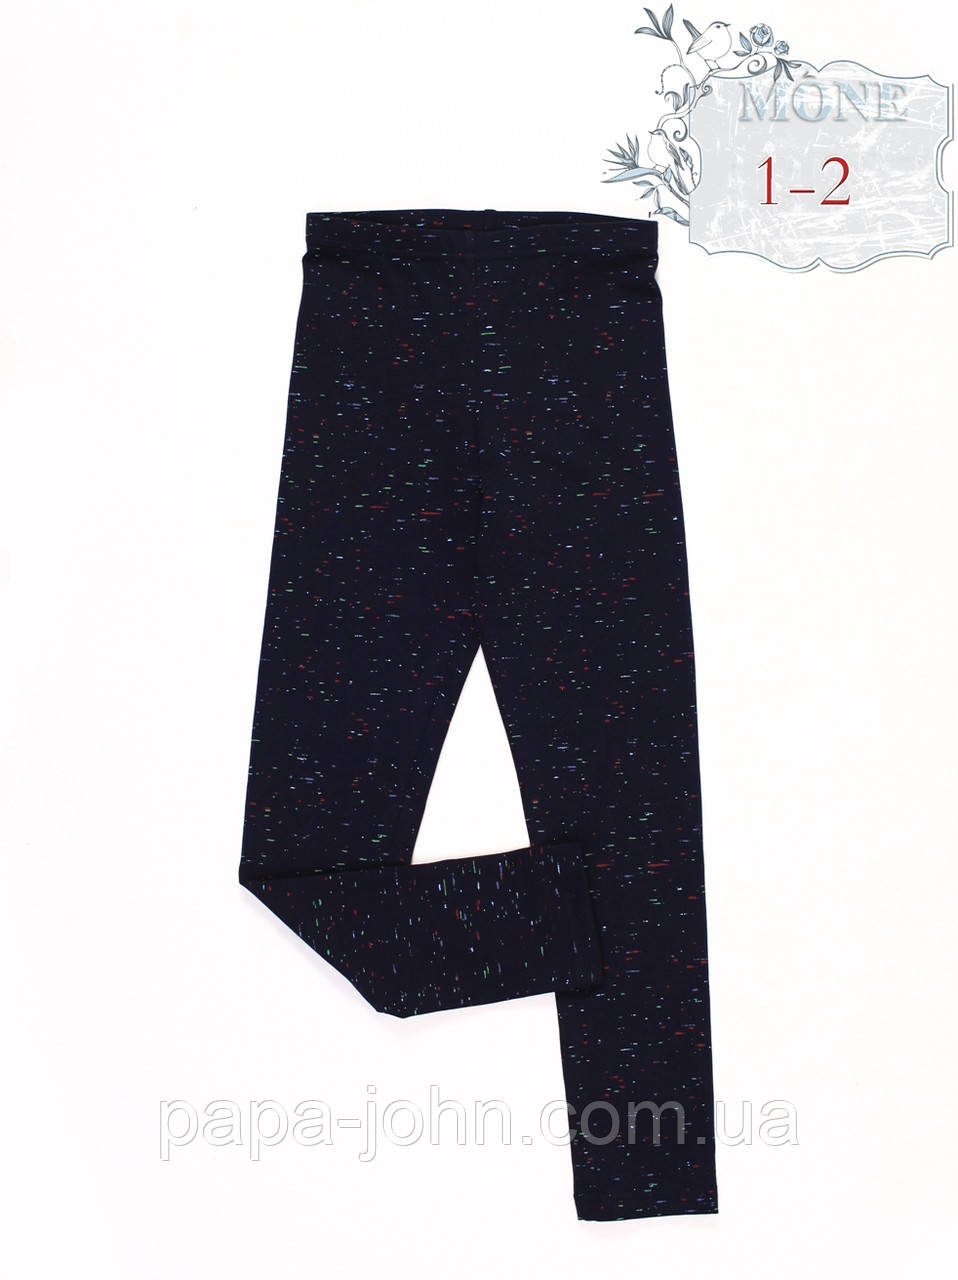 Лосины трикотаж  принт черта  ТМ Моне  р. 134 152